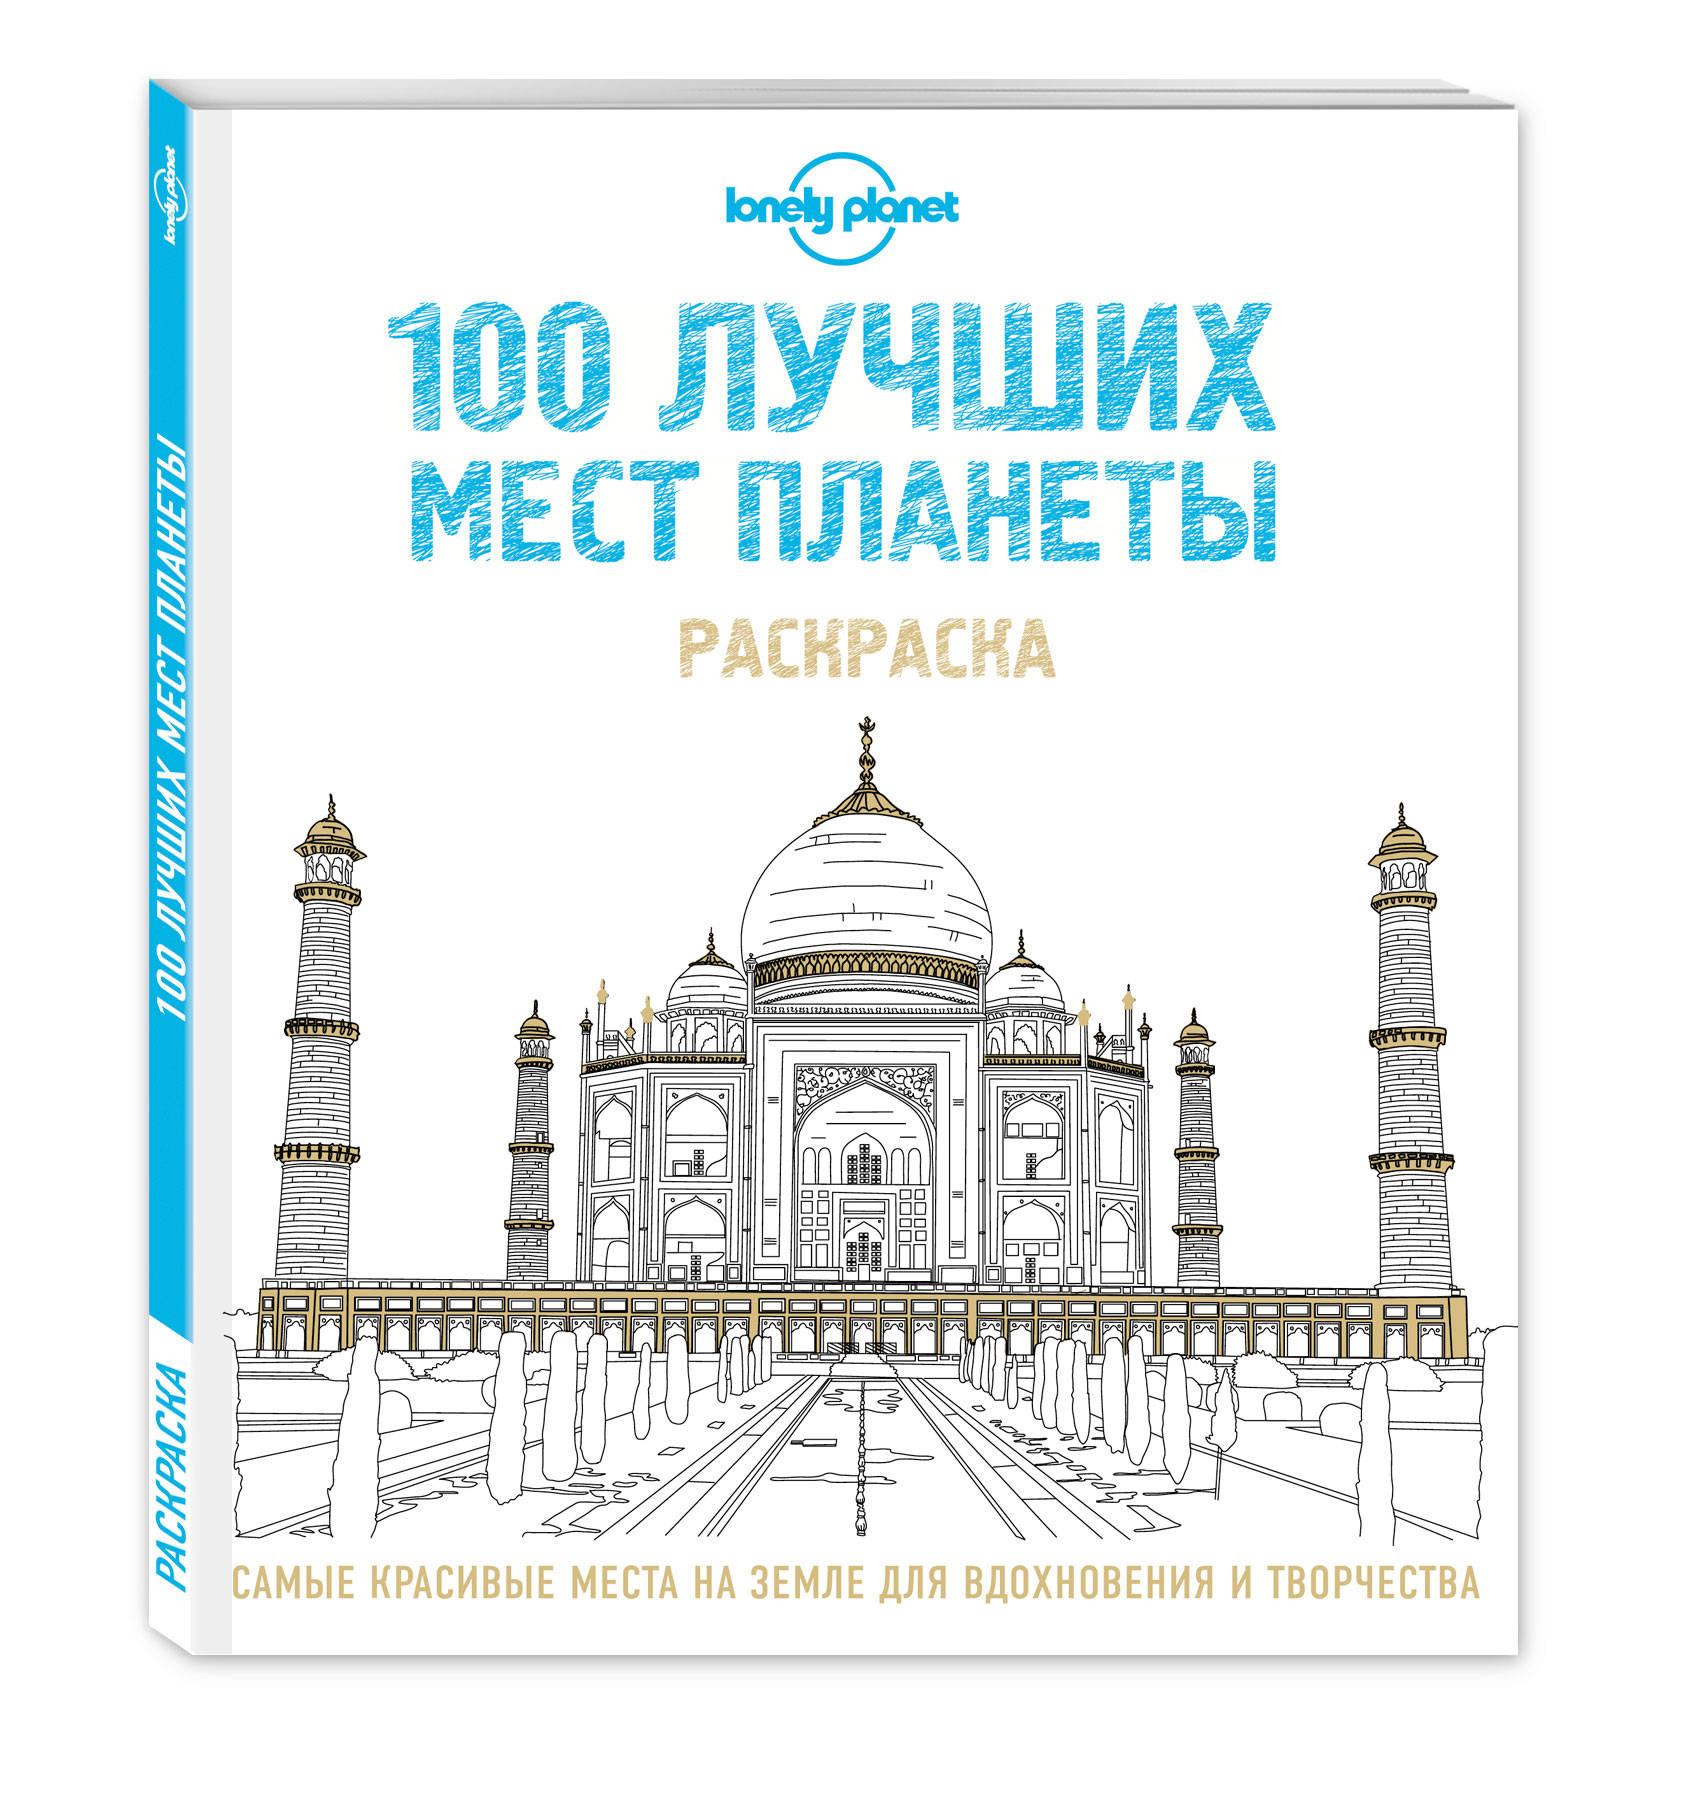 100 лучших мест планеты. Раскраска (Lonely Planet) костюм сталкер боец р 56 58 рост 176 010 1